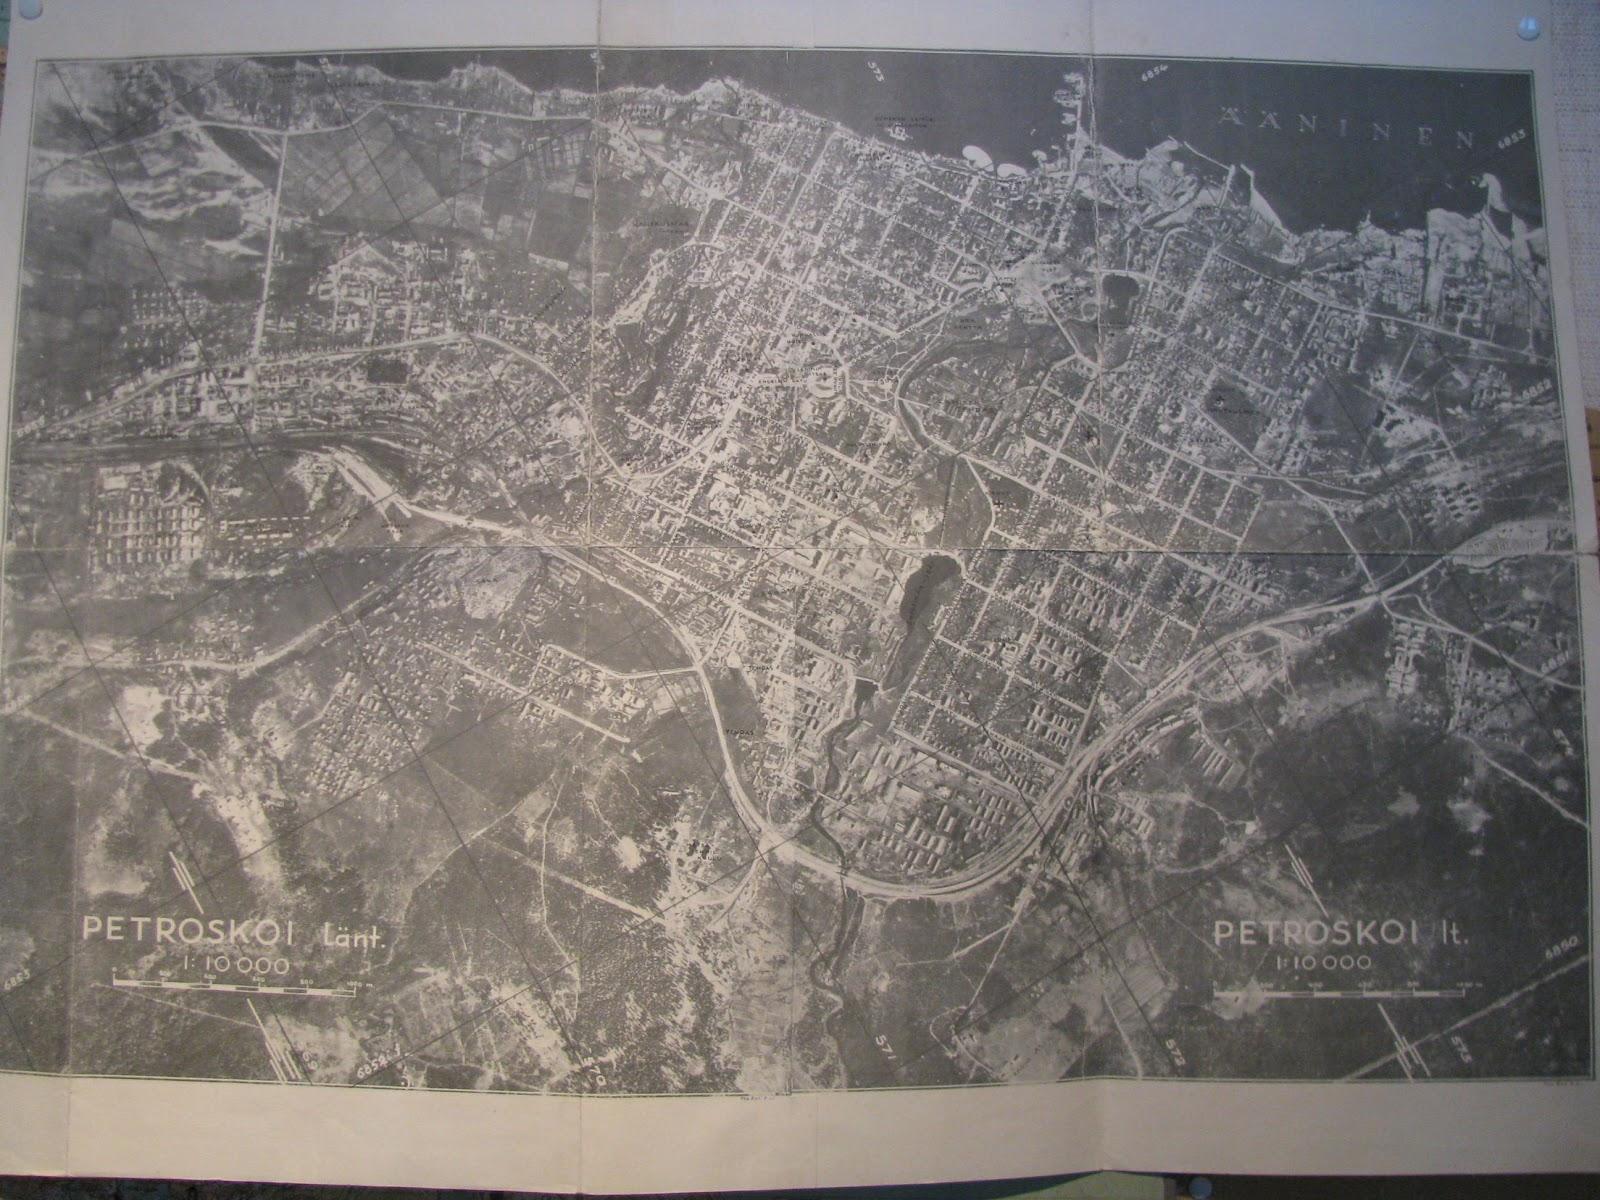 Sotiemme Kartat Petroskoin Valtaus Ik Kartat